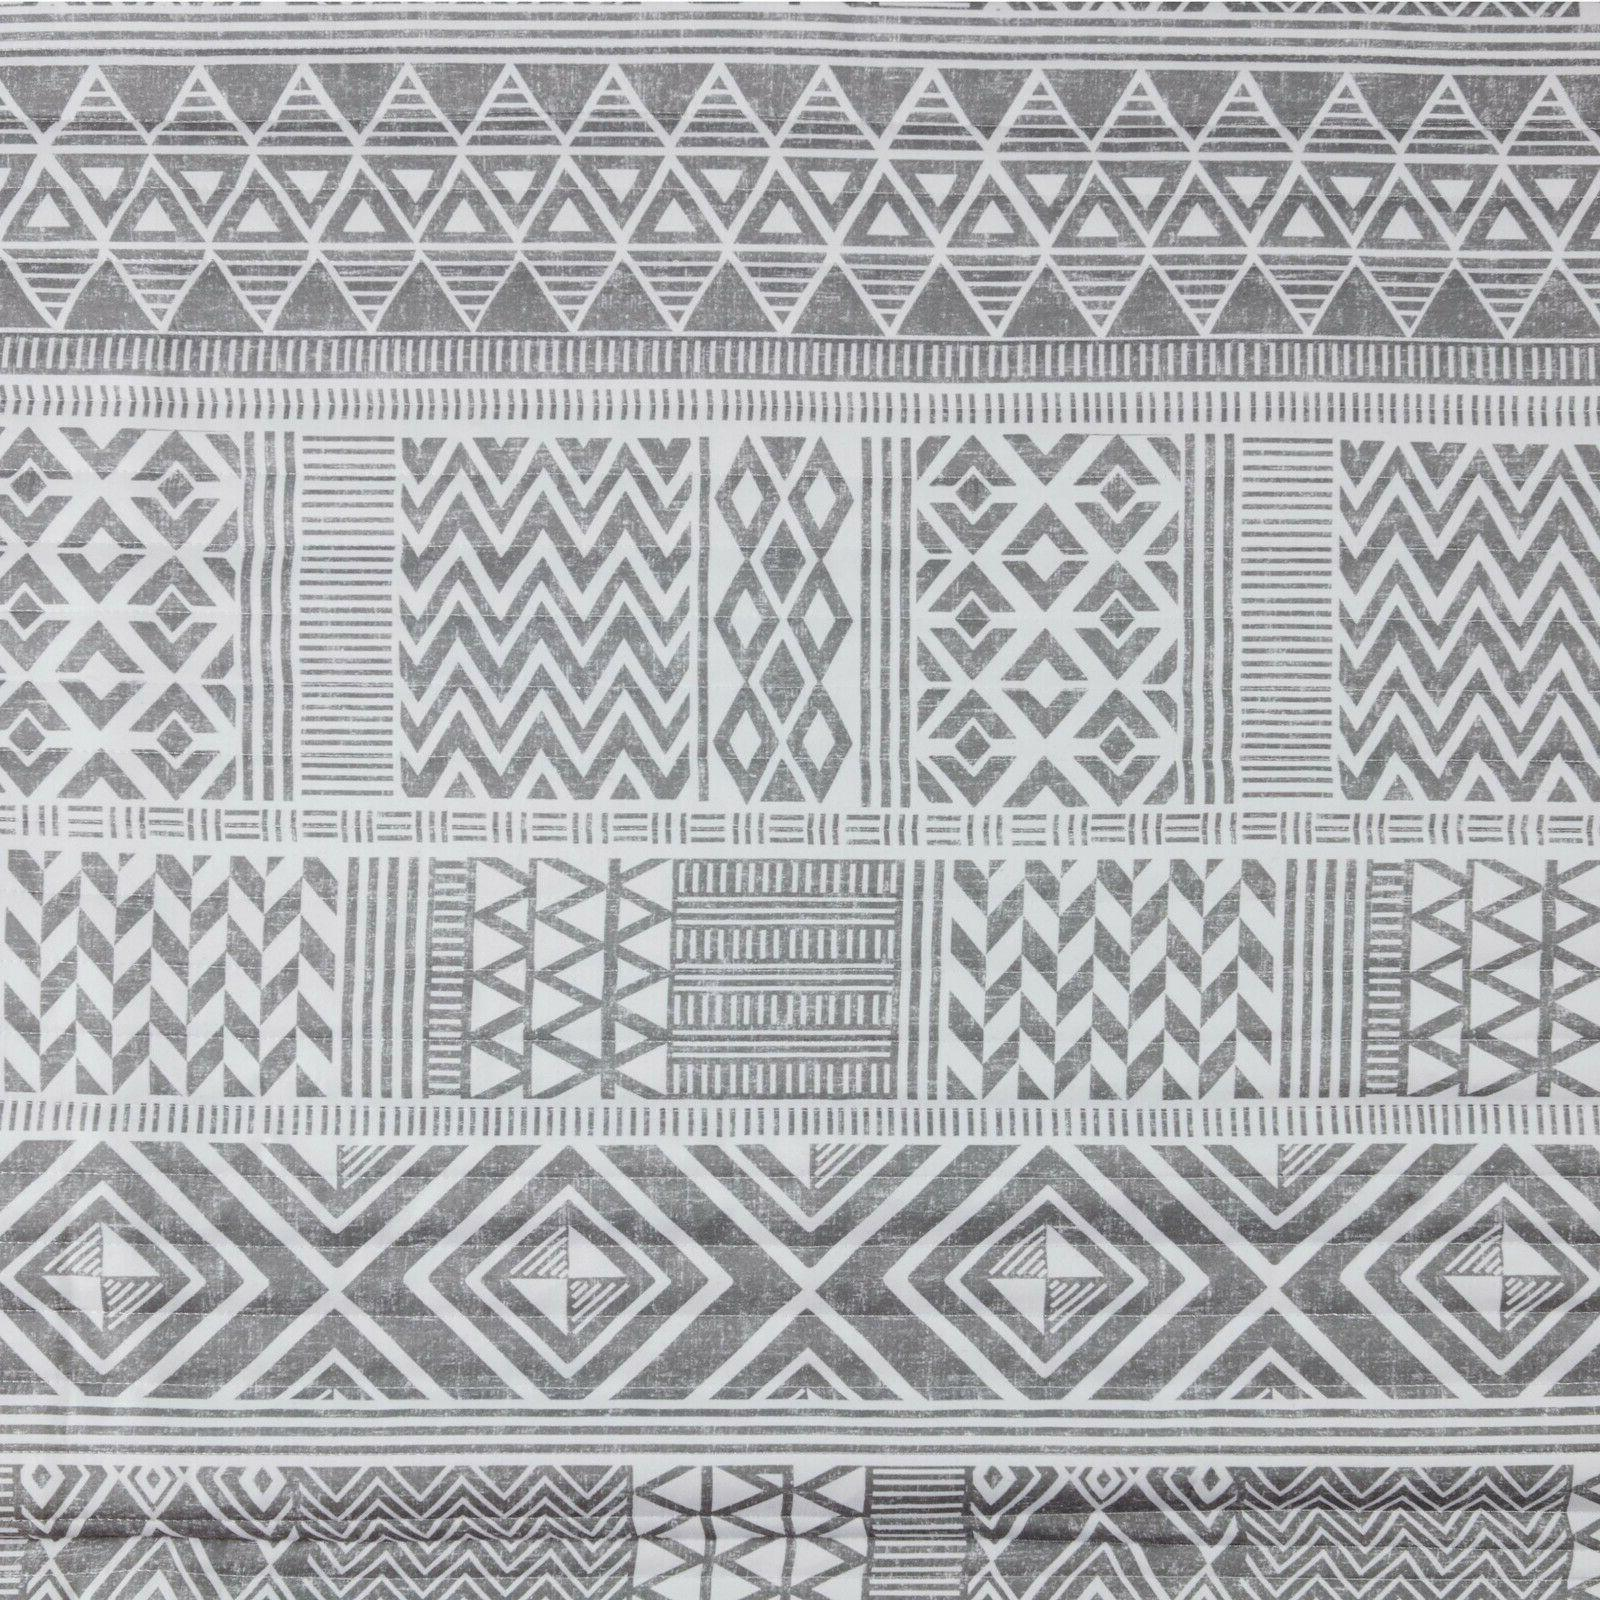 Quilt Geometric Warm